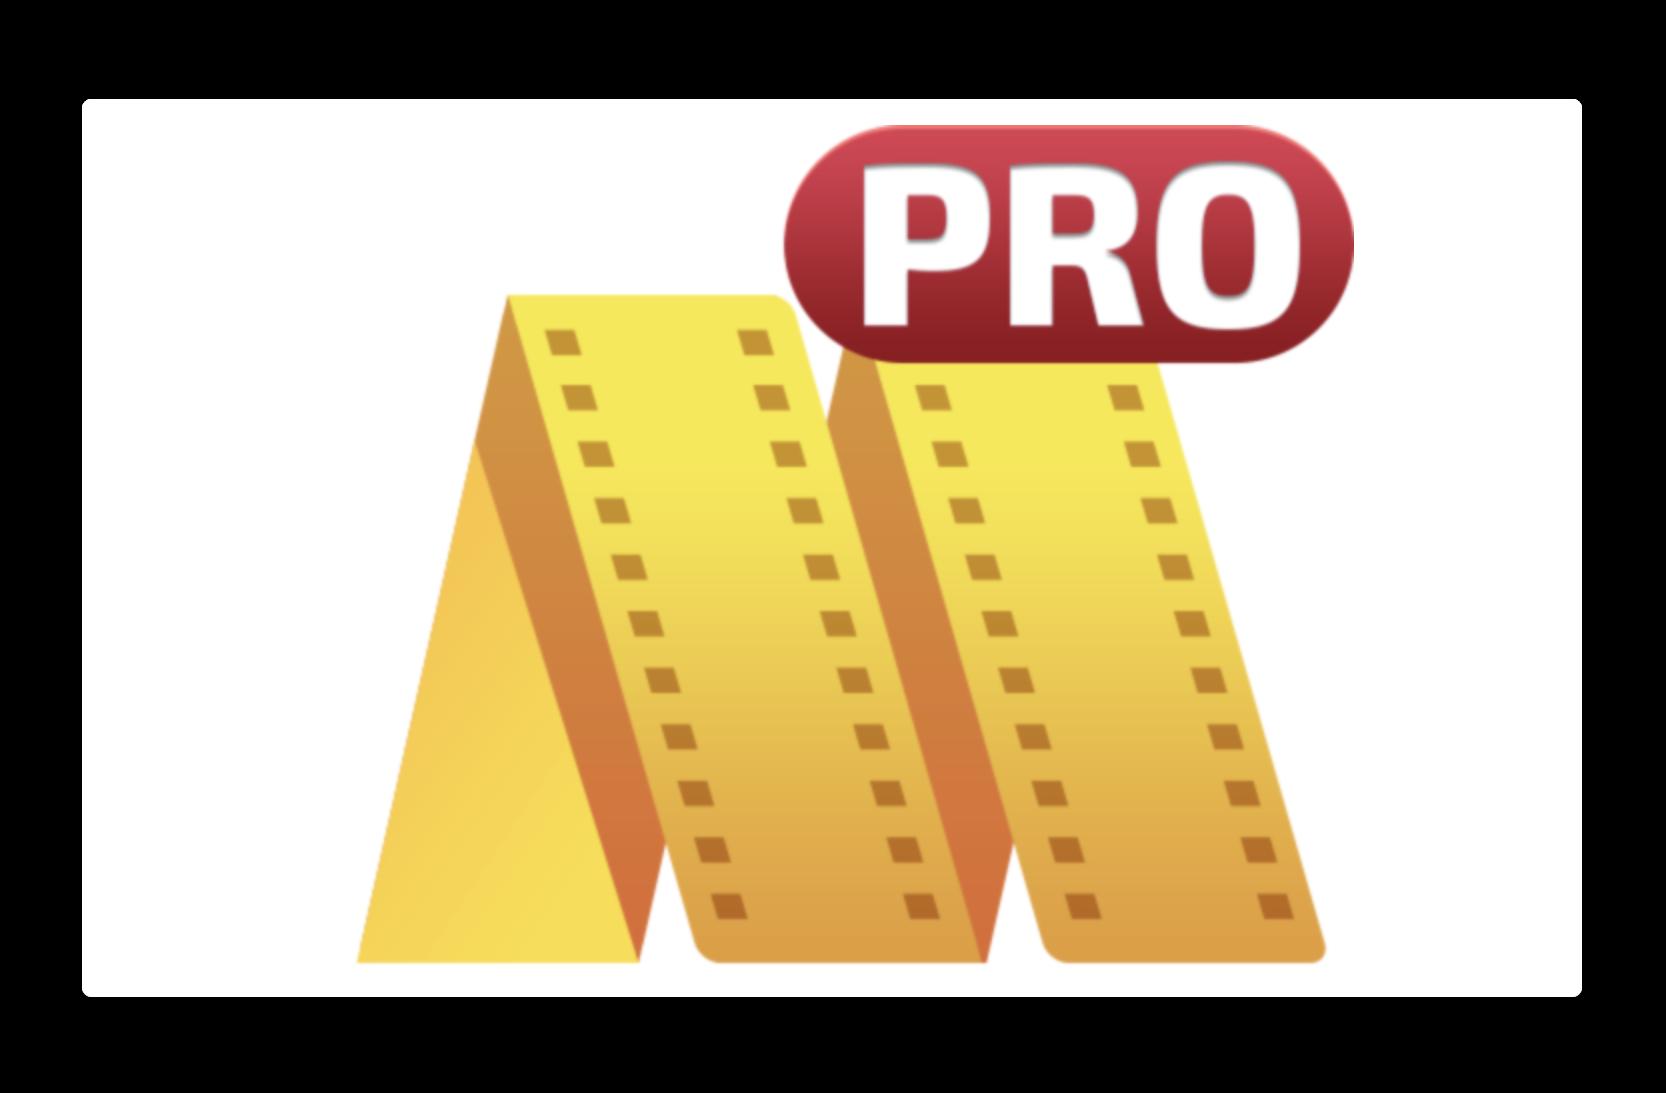 【Mac】プロフェッショナルマックビデオ編集ソフト「Video Editor MovieMator Pro 」が95%オフ